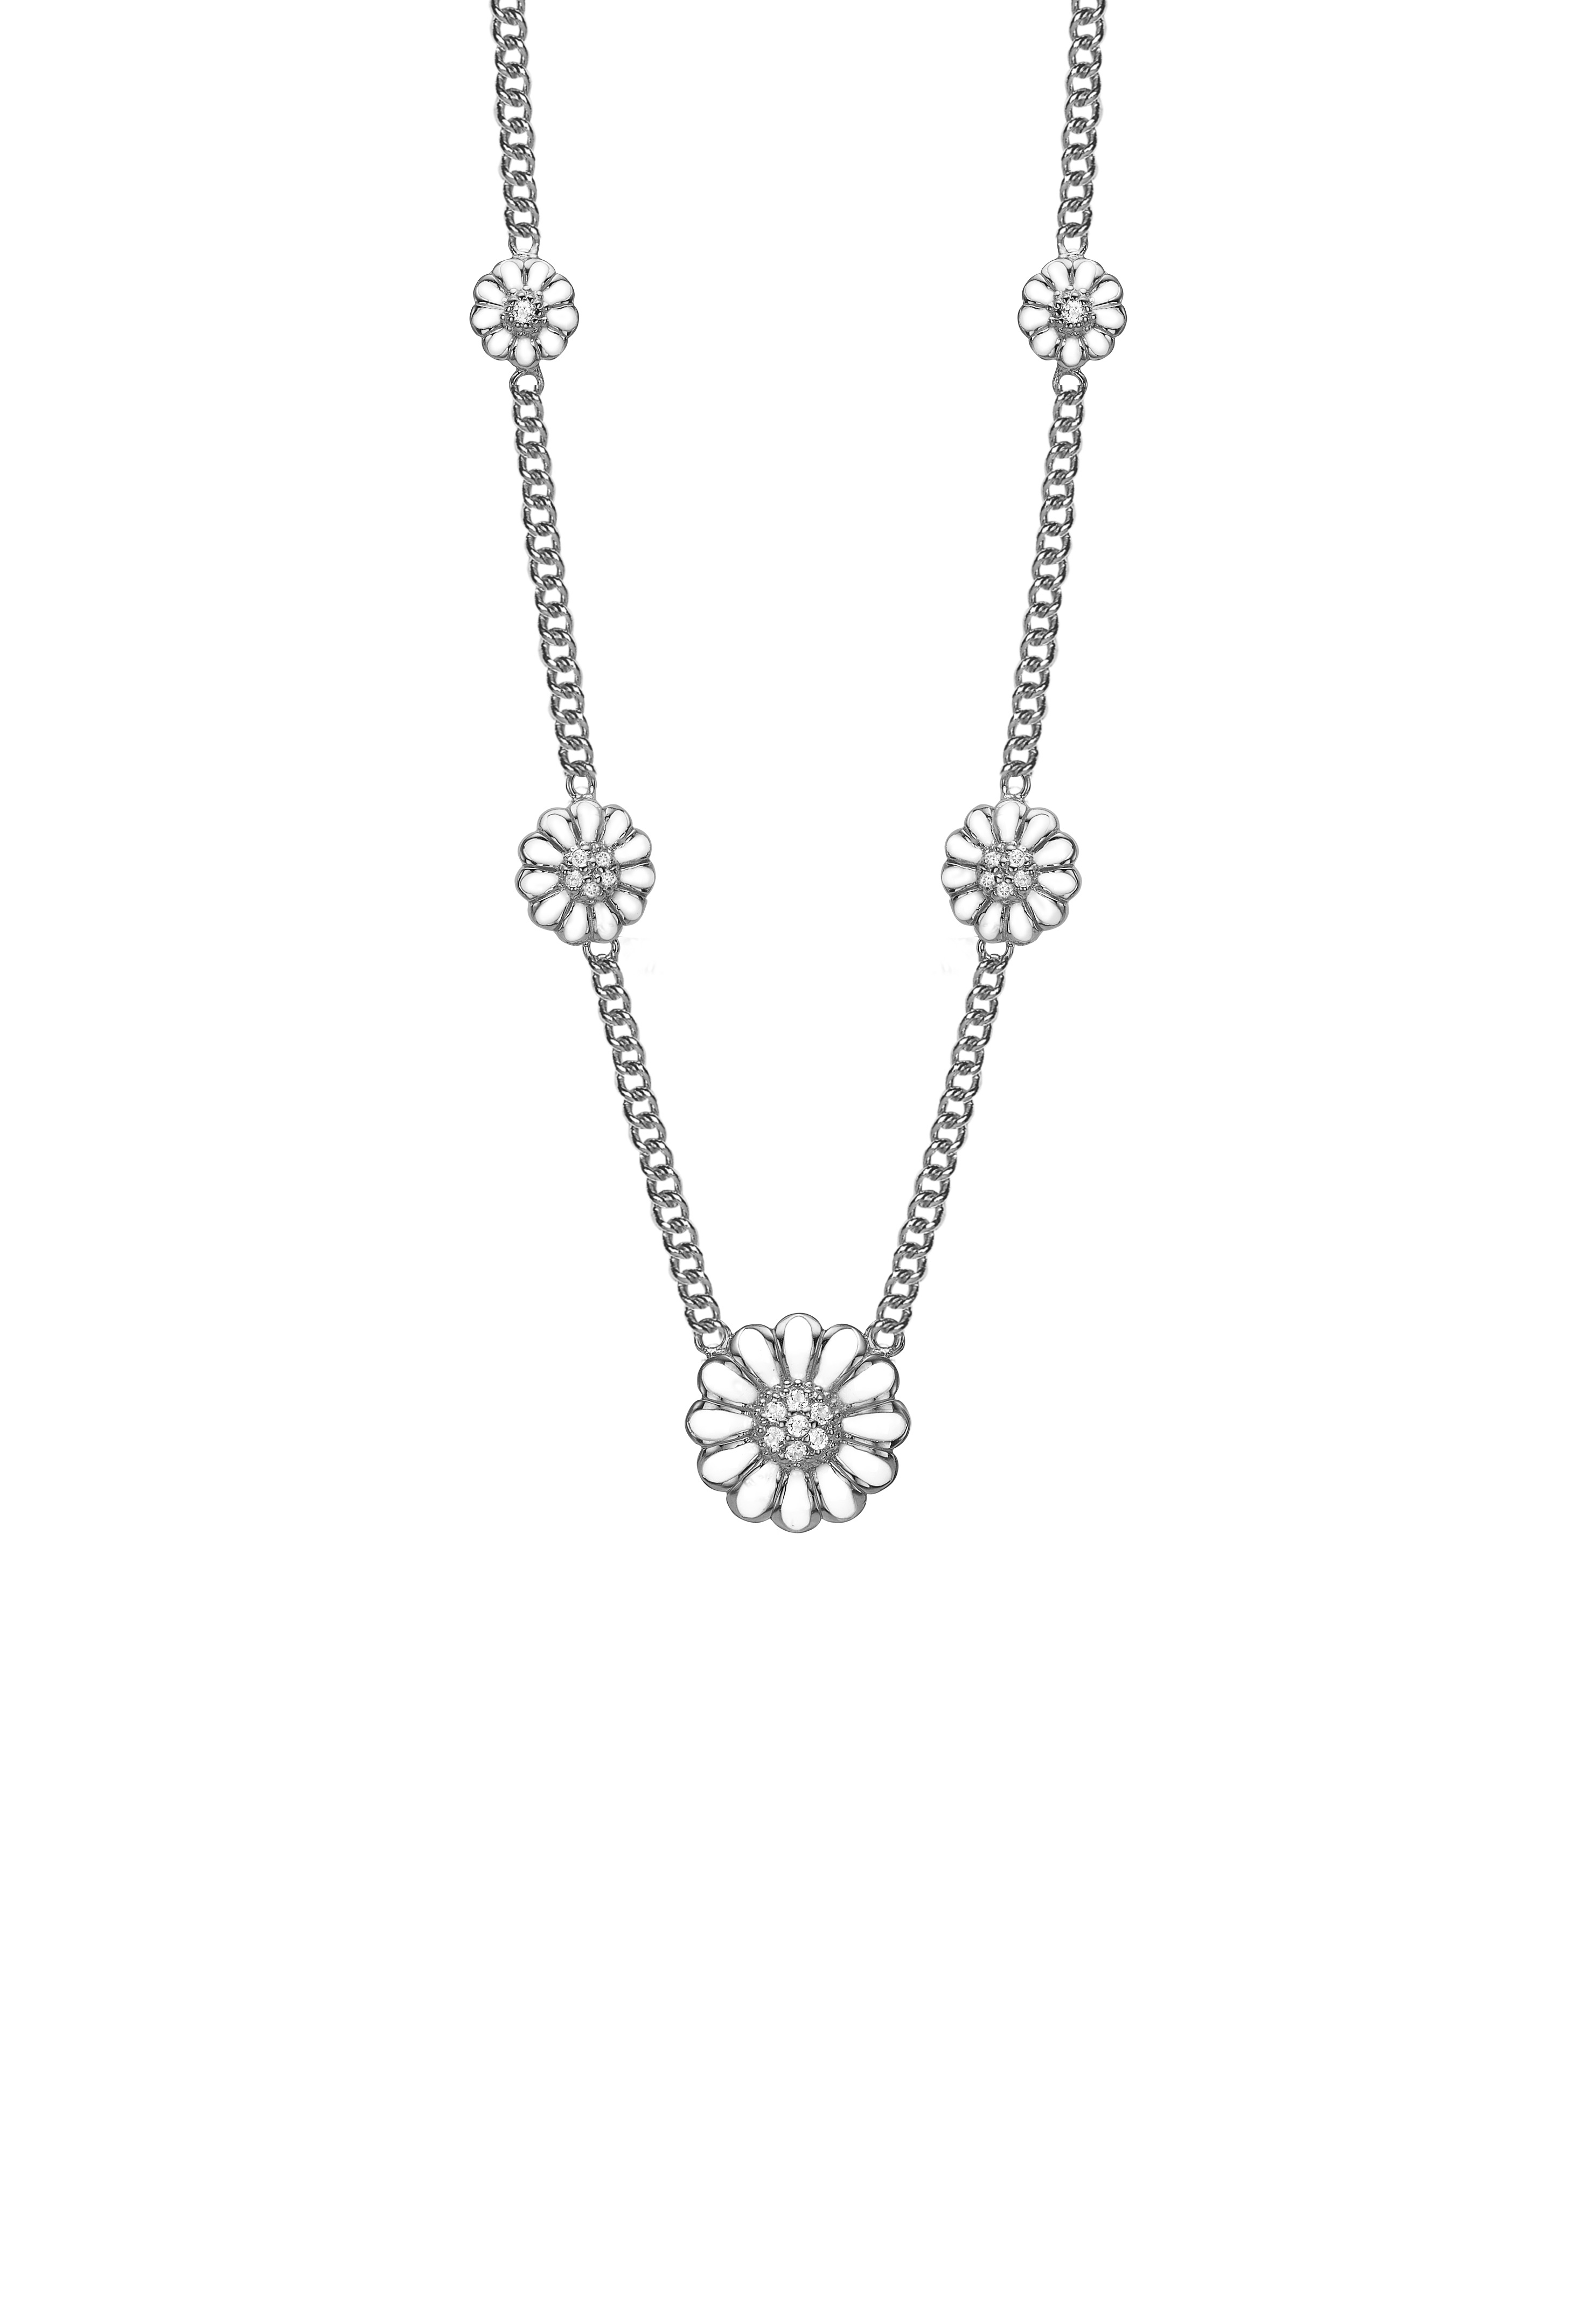 Christina marguerite multi necklace - 680-S27-55